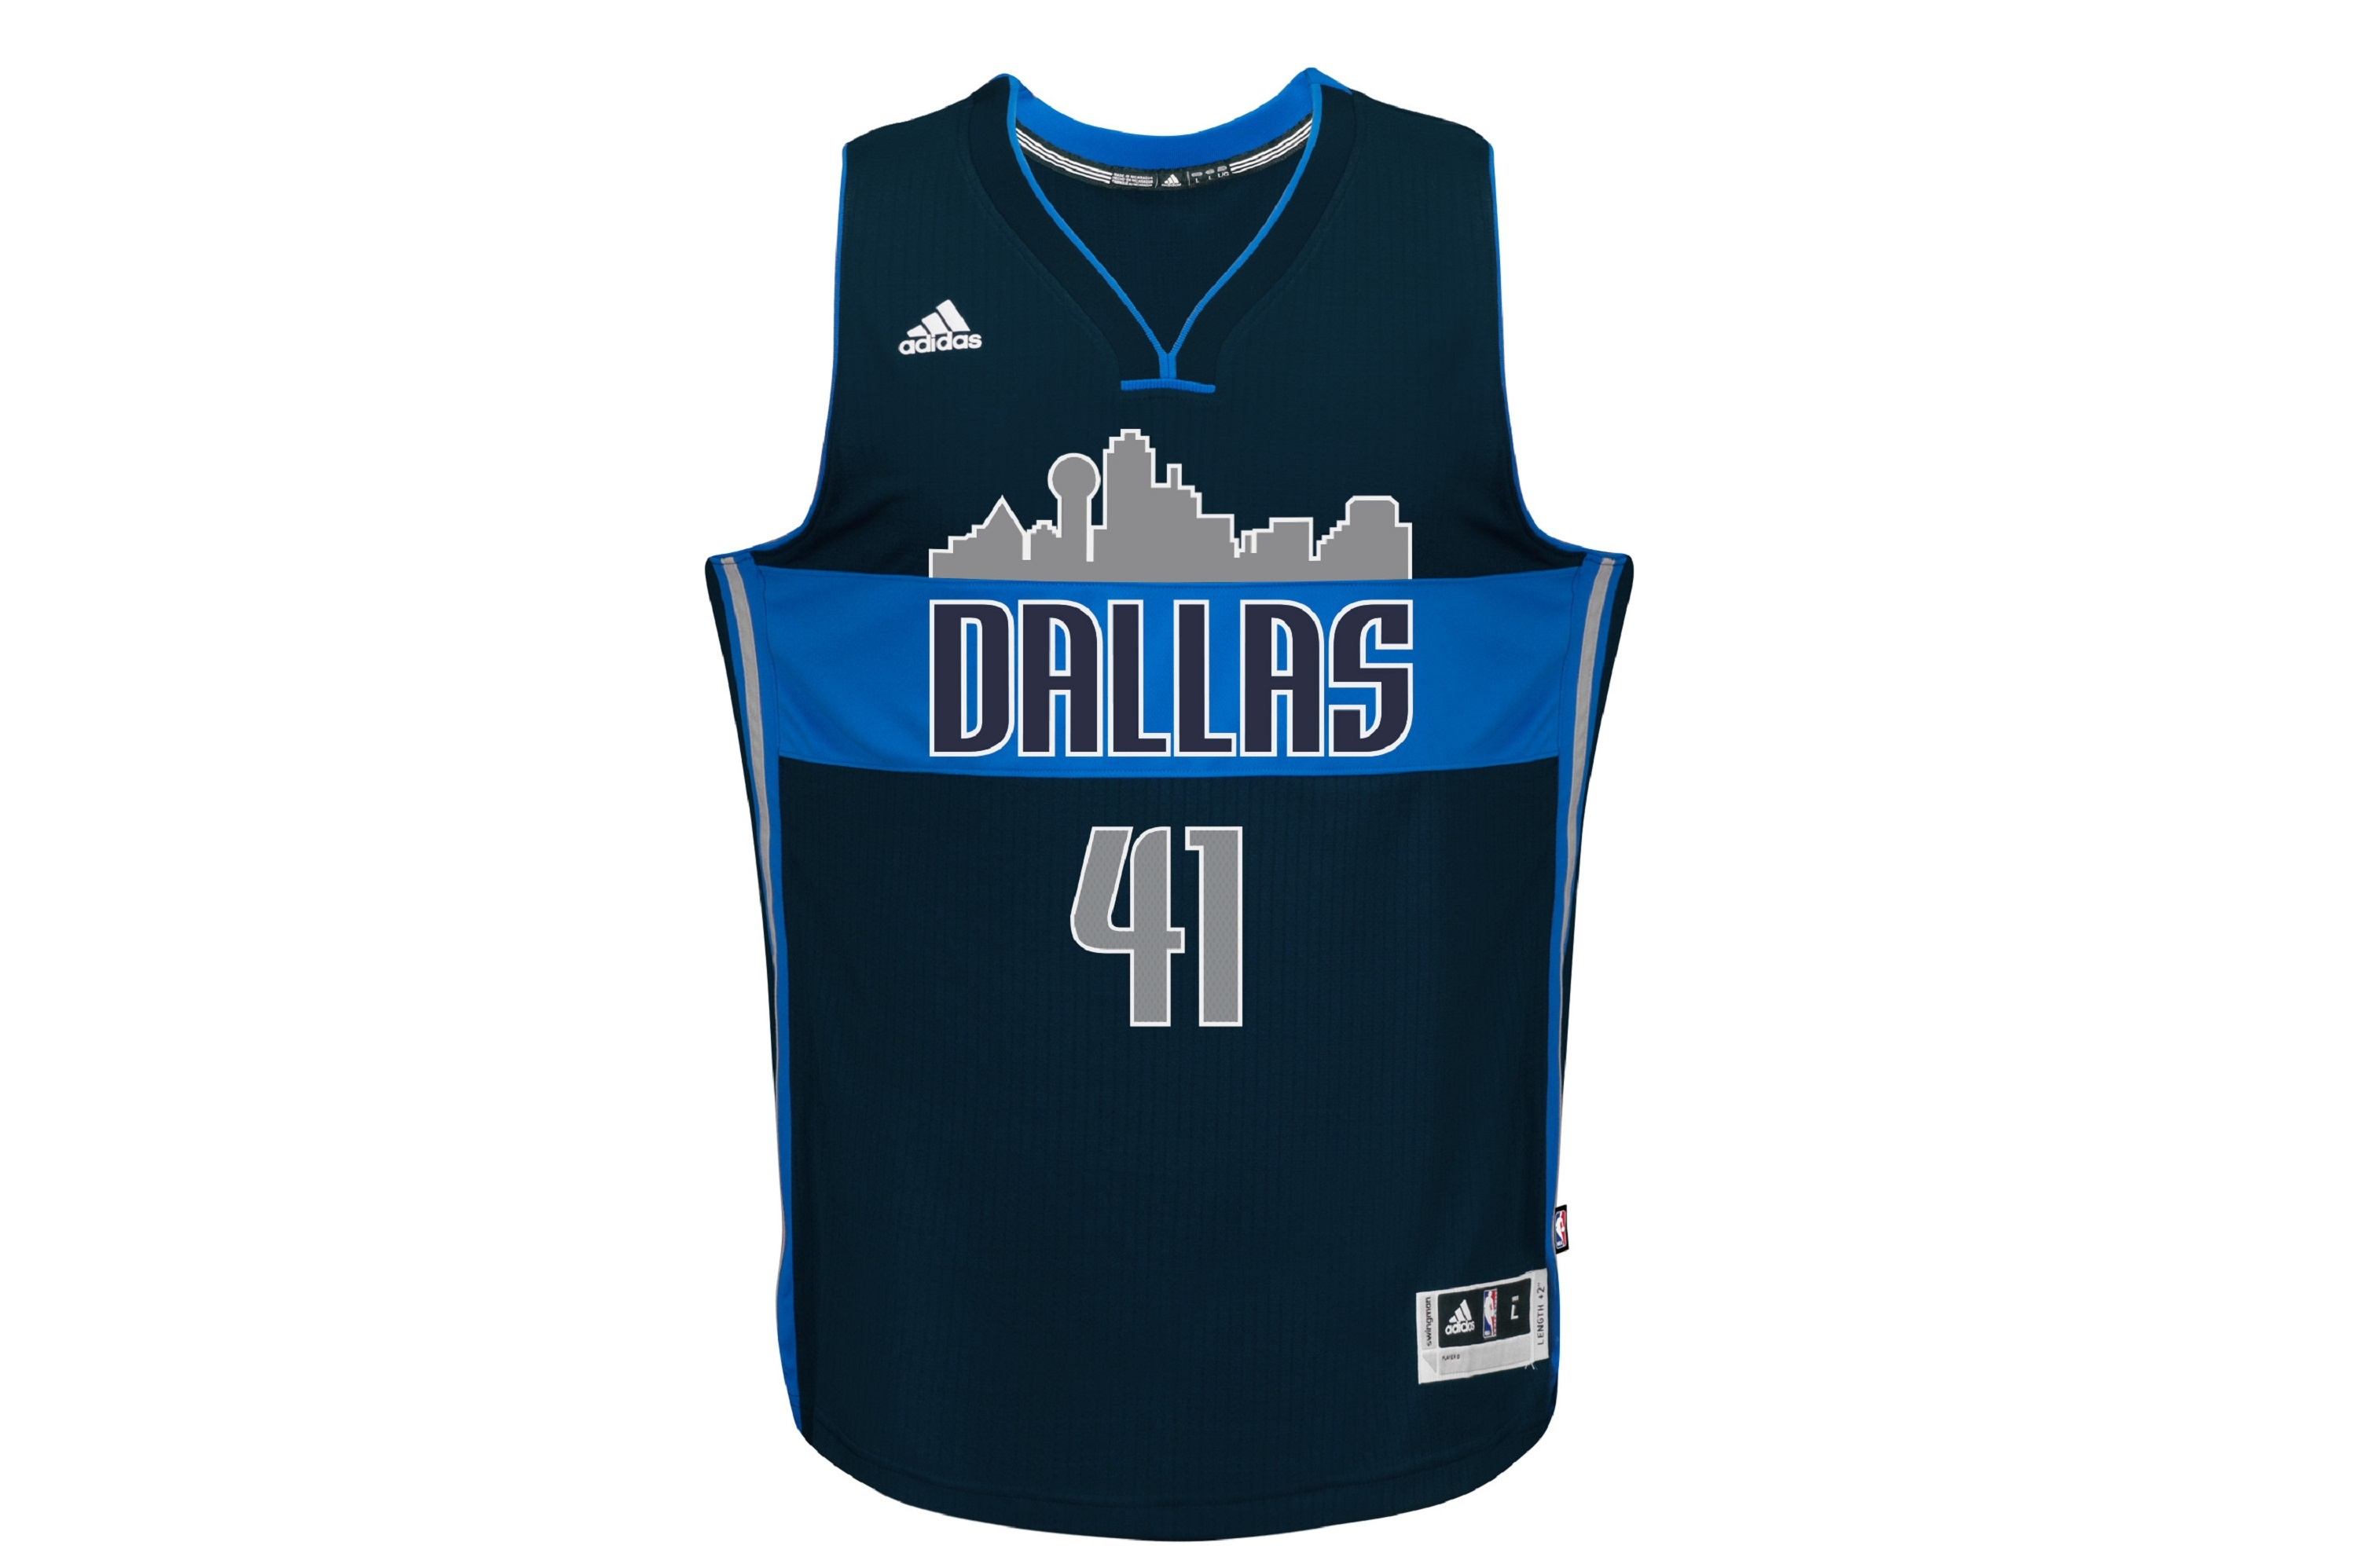 Dallas Mavericks Background